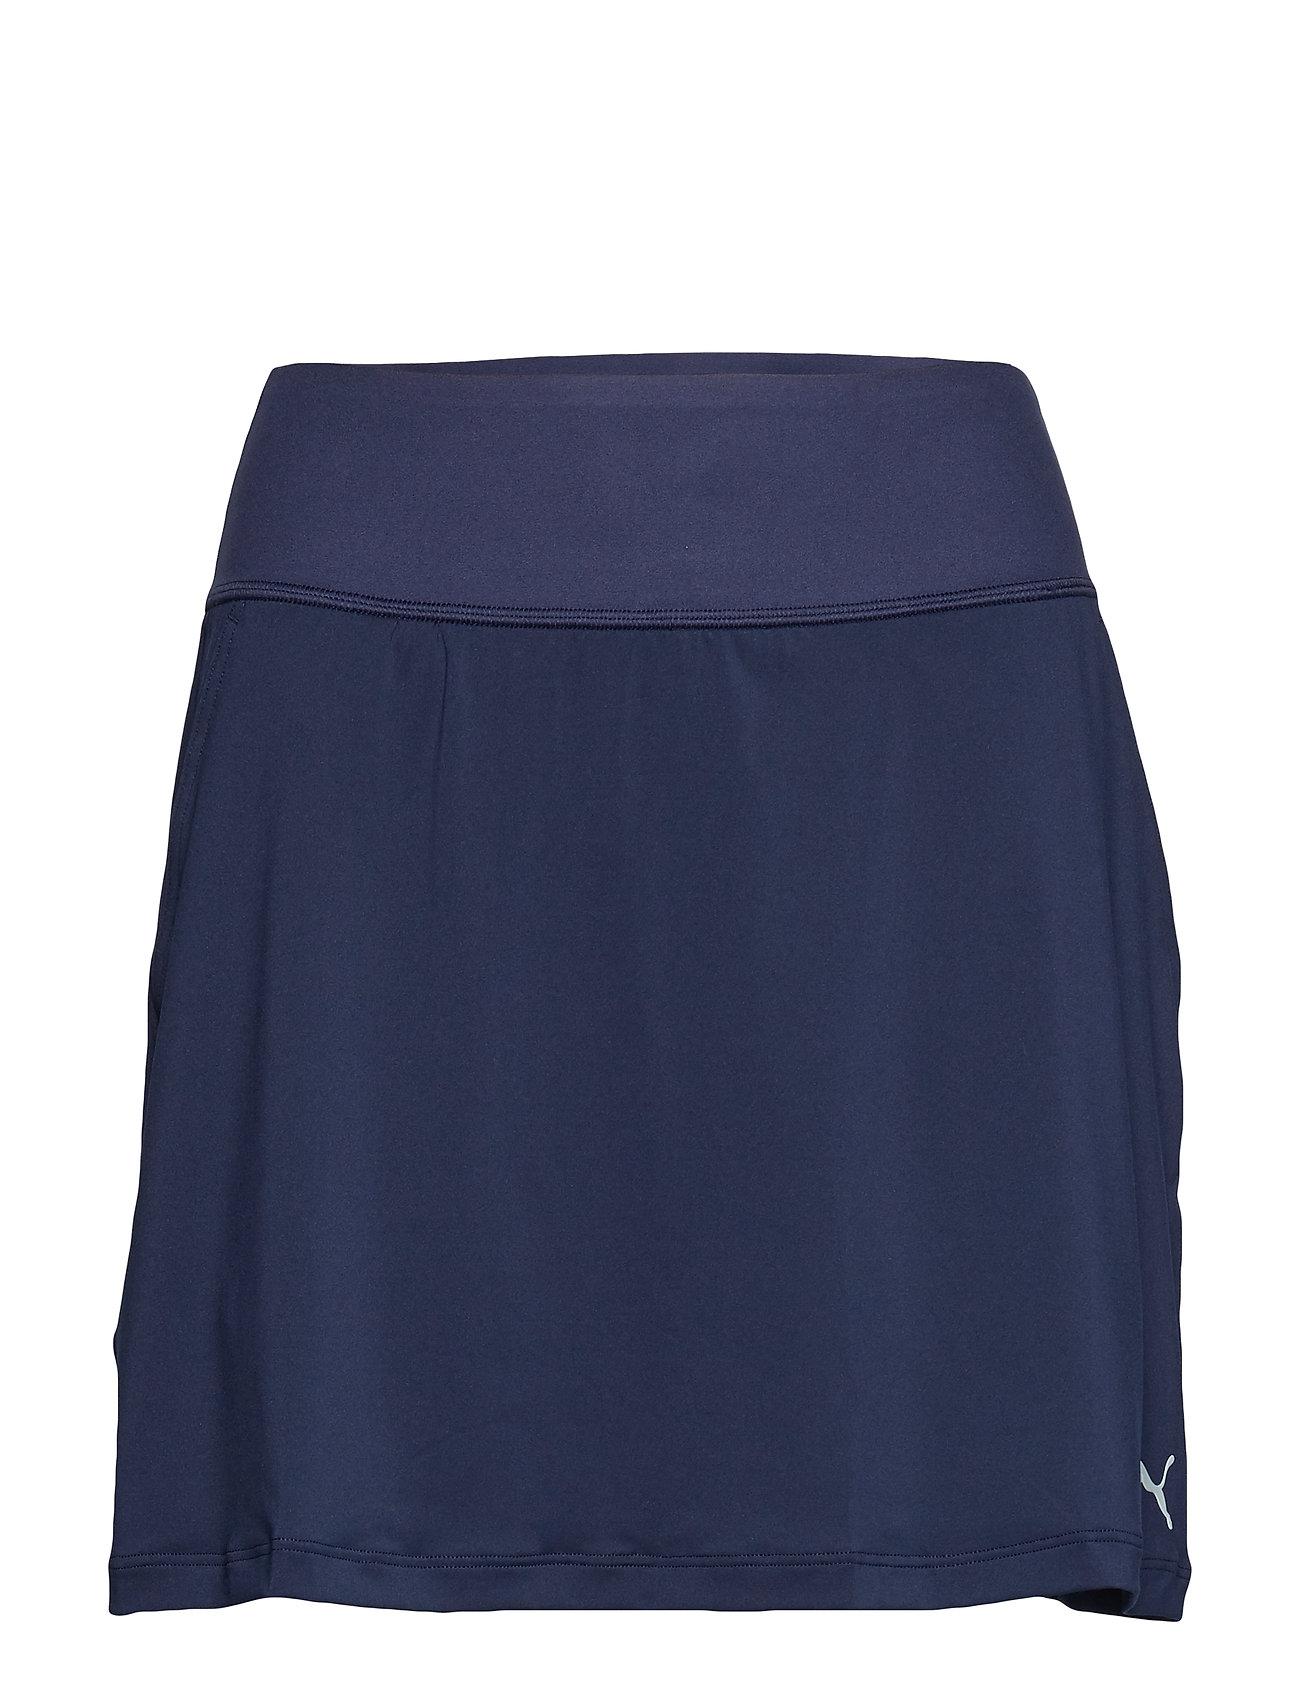 PUMA Golf PWRSHAPE Solid Knit Skirt - PEACOAT